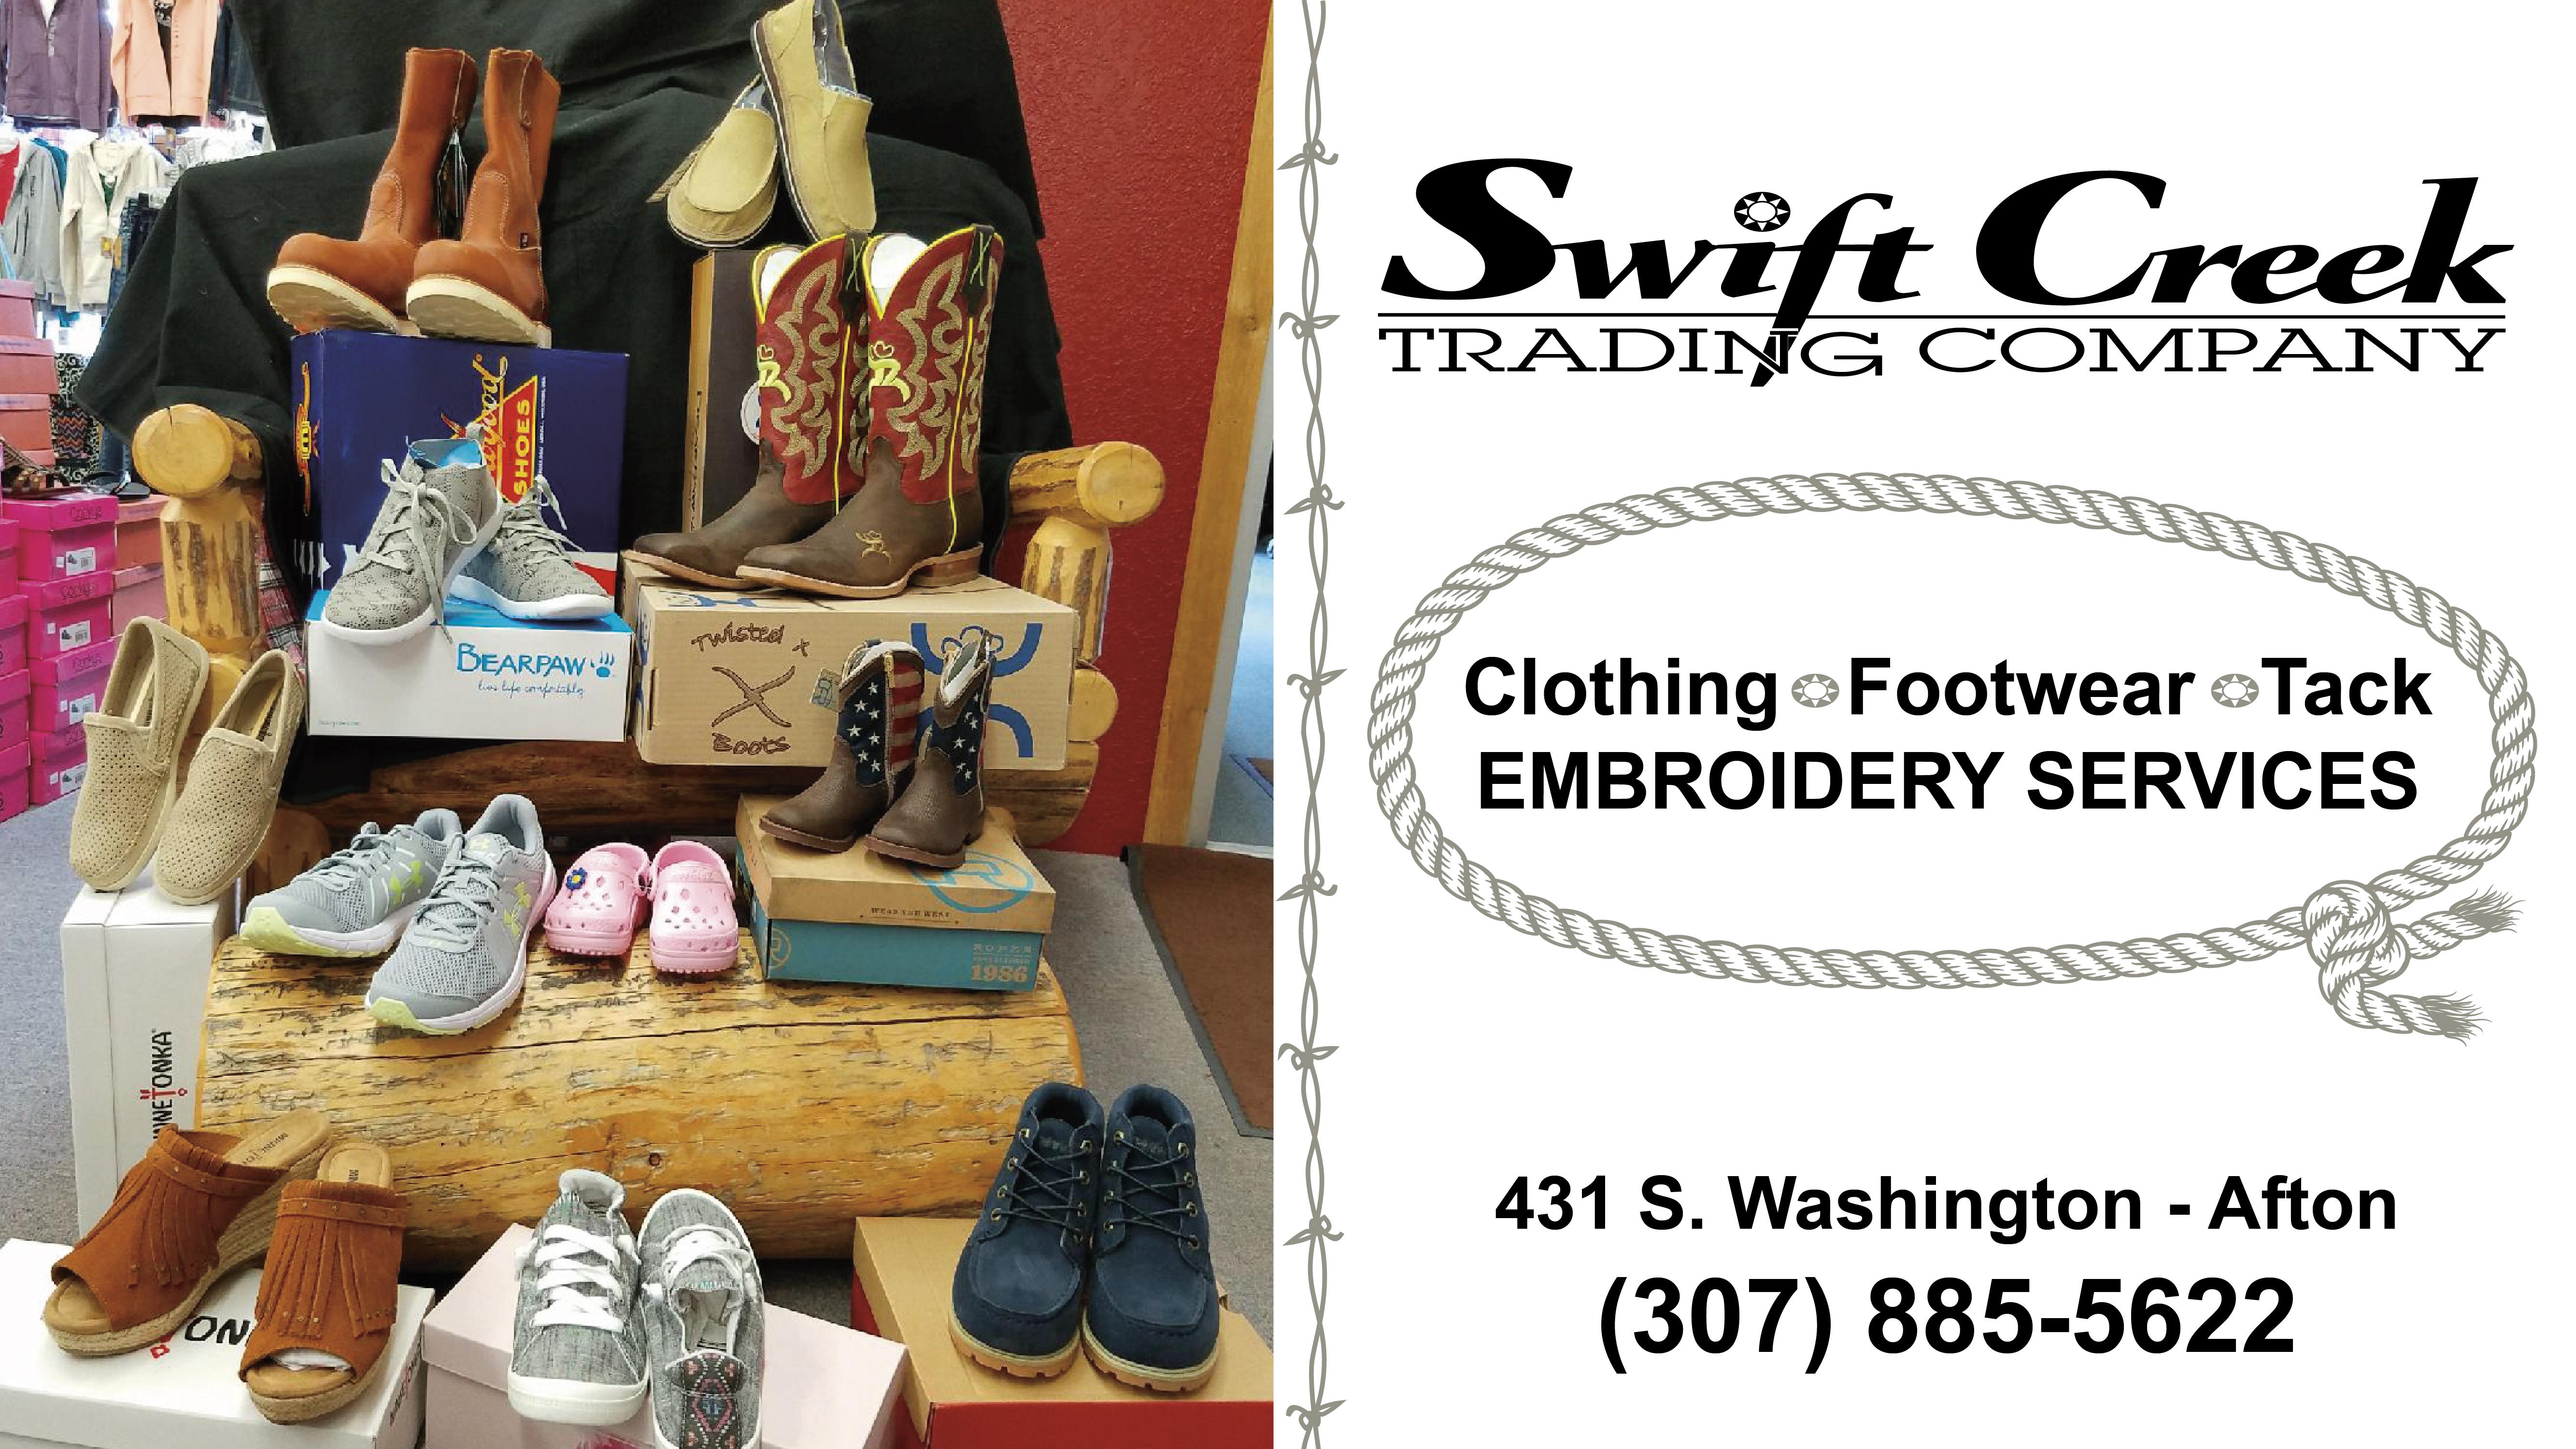 Swift Creek Trading Ad